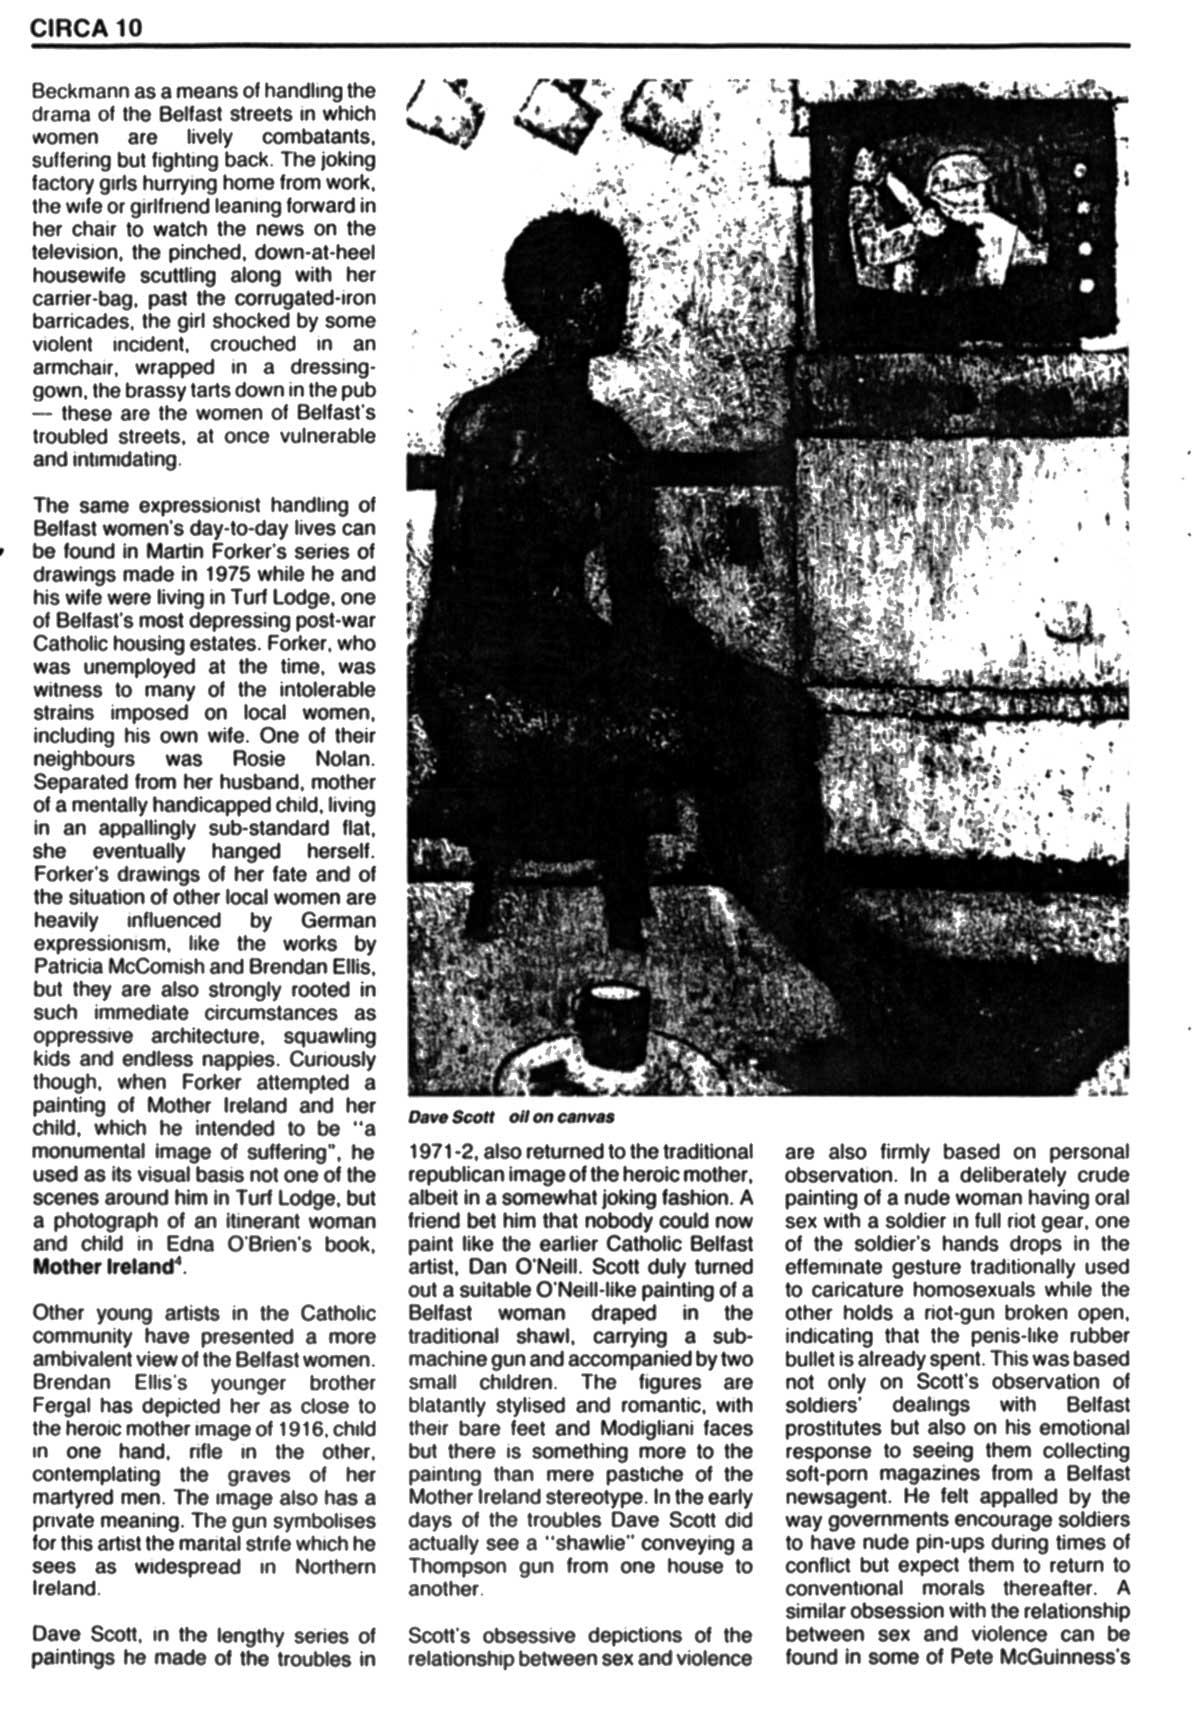 Issue 1: November / December 1981, p. 10